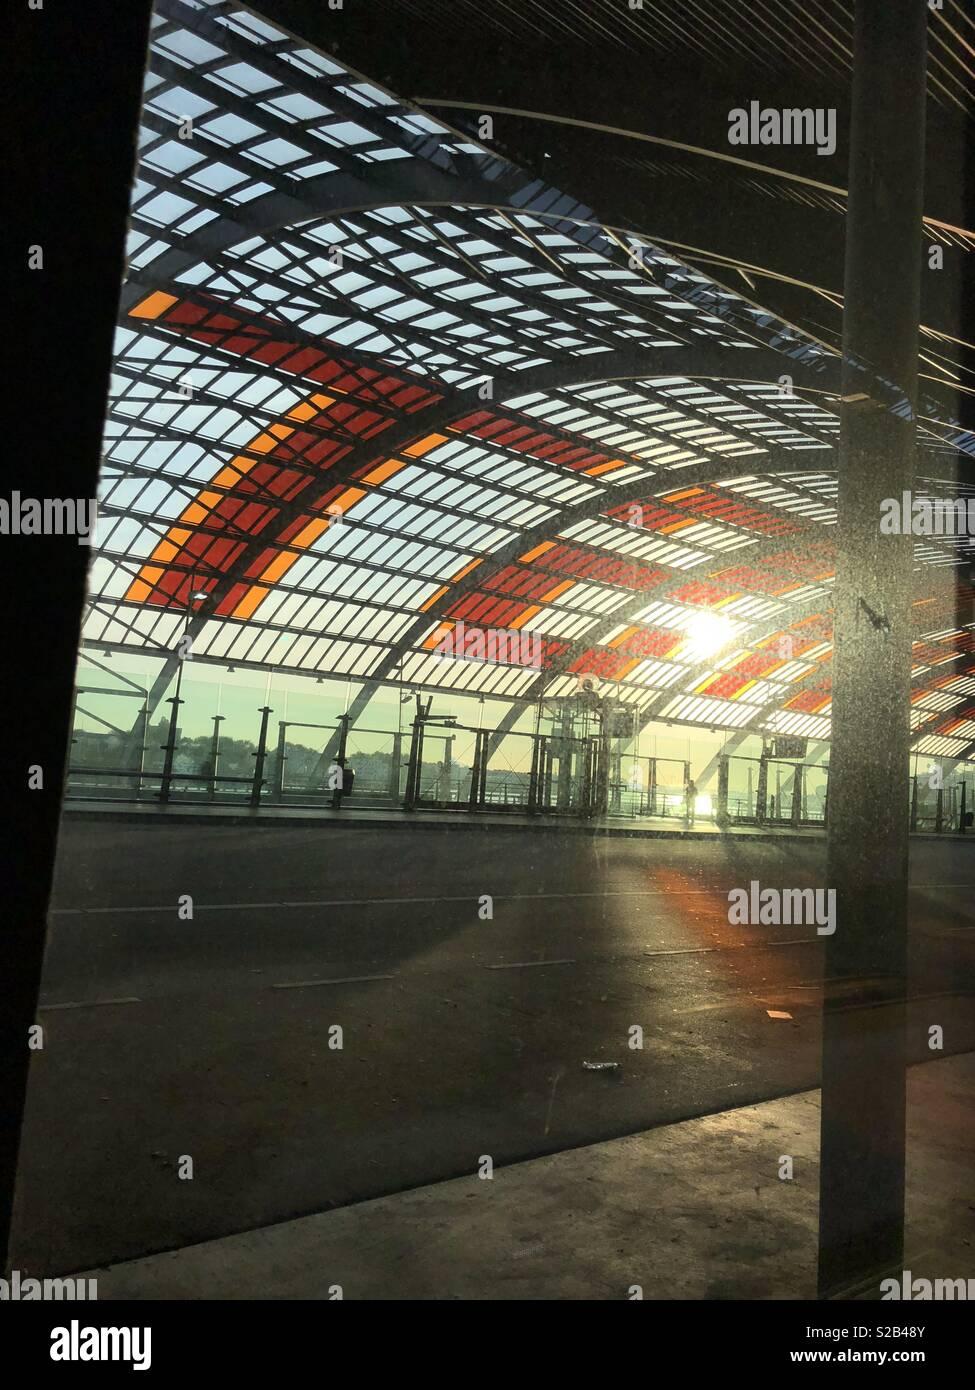 Station - Stock Image